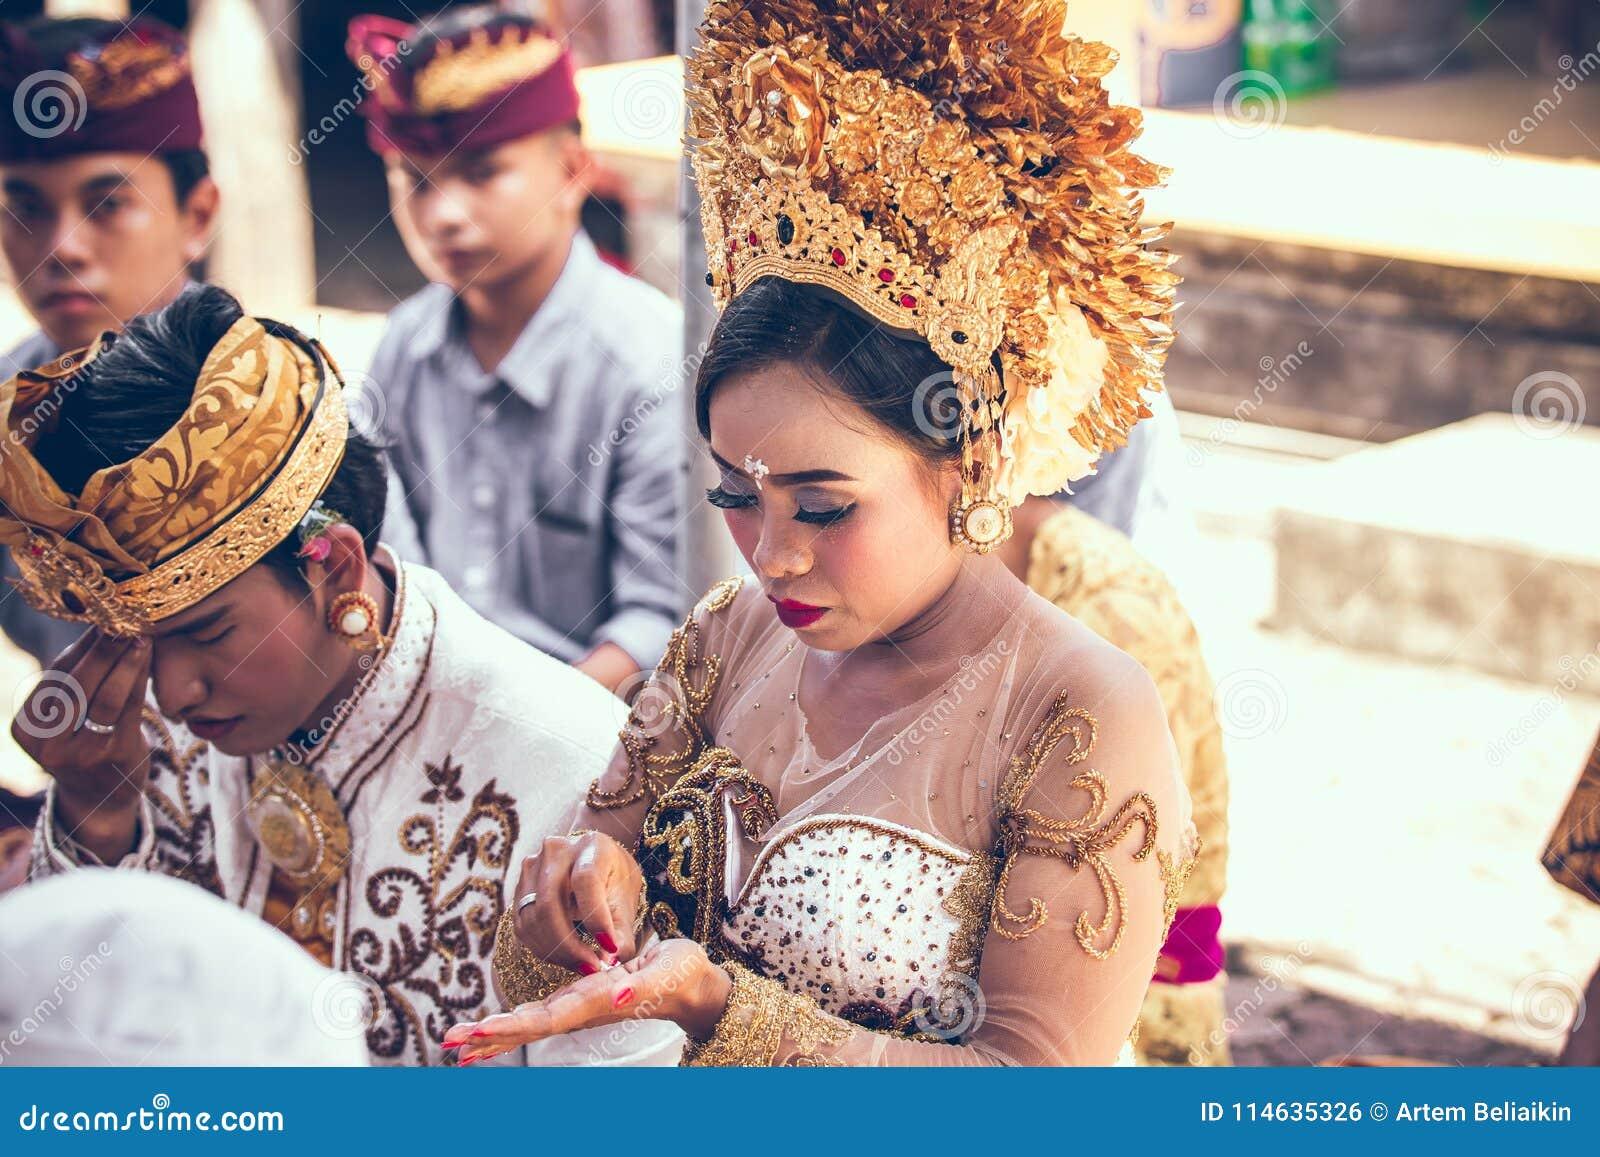 Wedding Ceremony Traditional.Bali Indonesia April 13 2018 People On Balinese Wedding